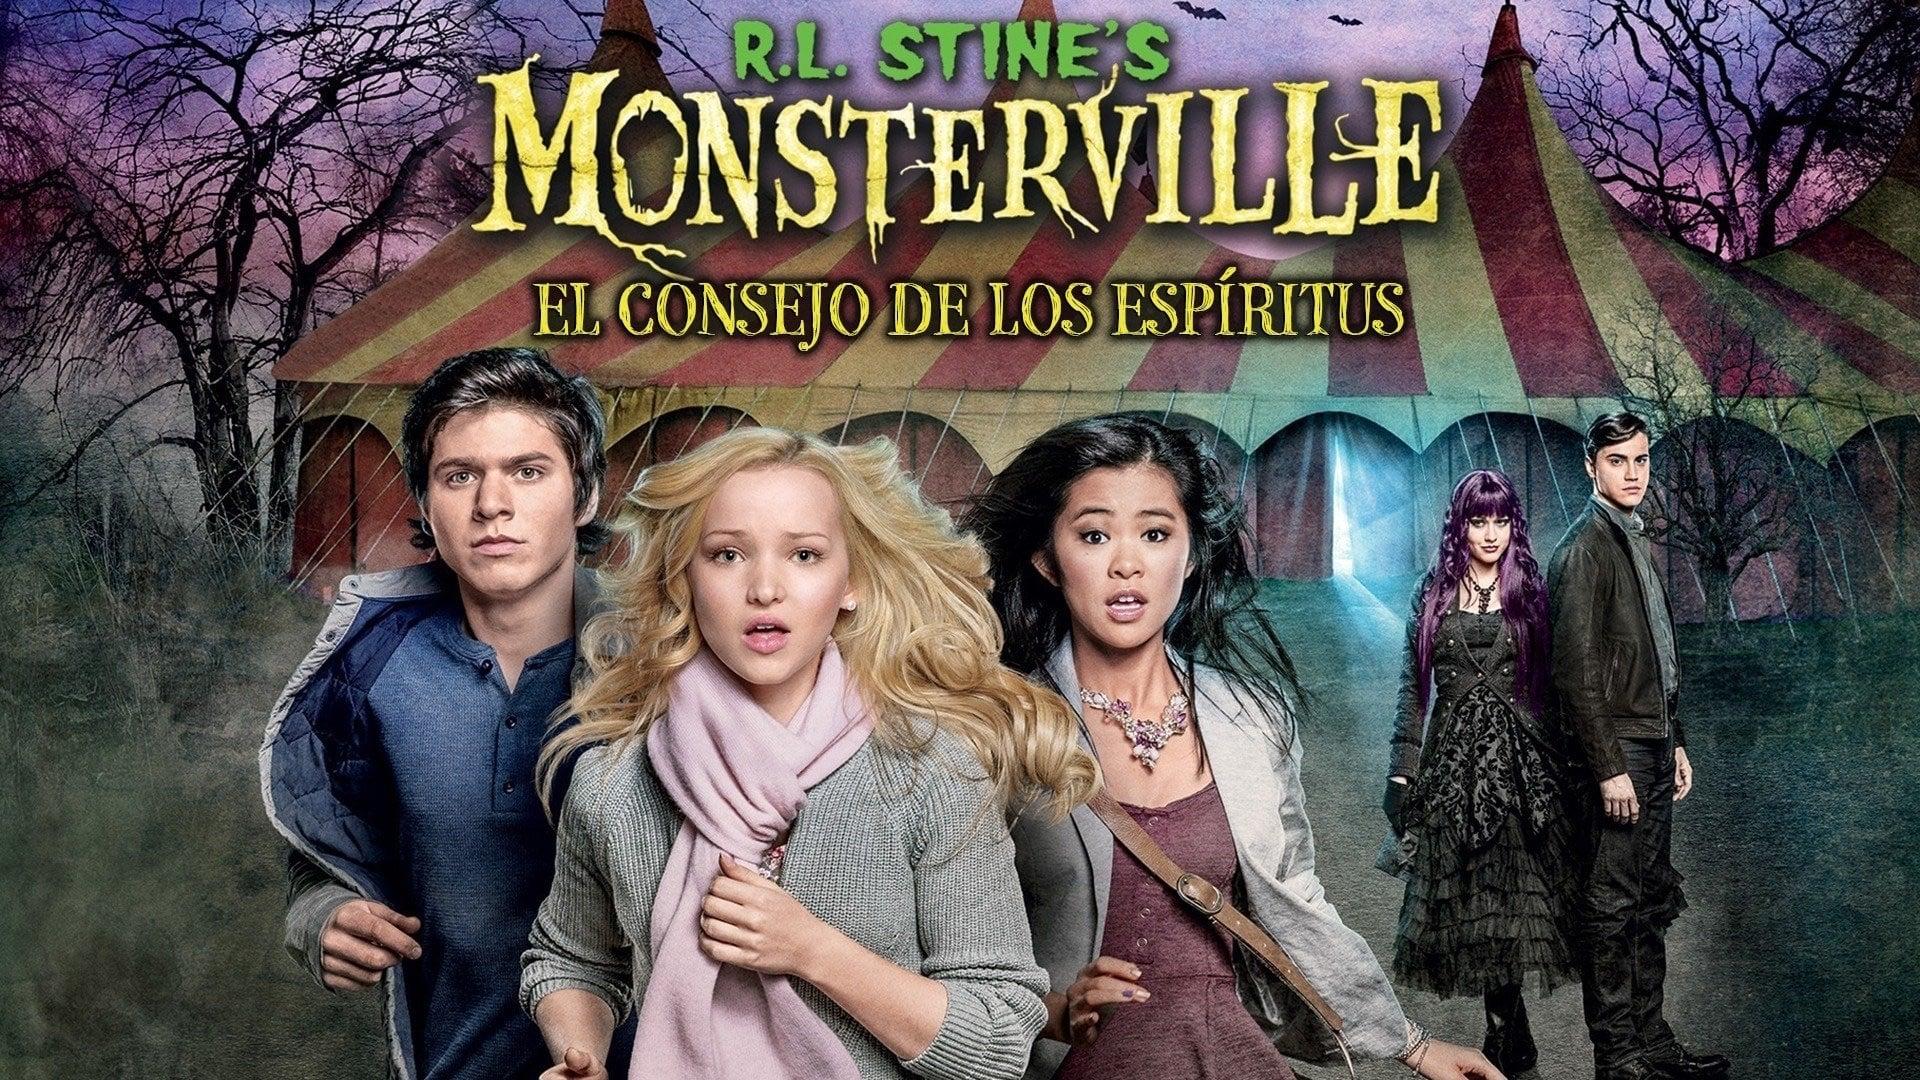 Монстервил